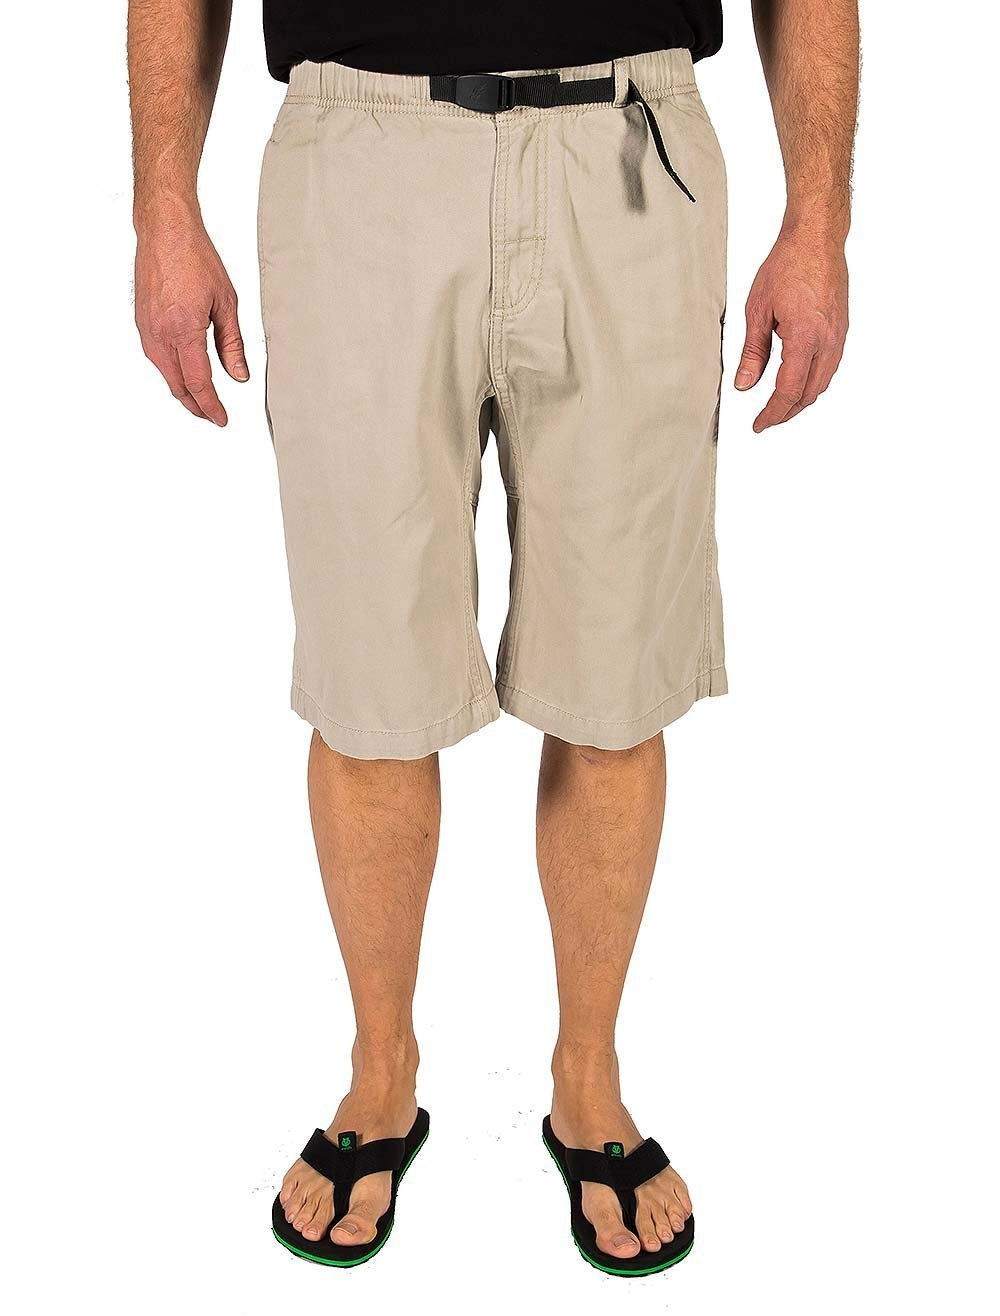 Gramicci Men's Rockin Sport Shorts, Old Stone, Small by Gramicci